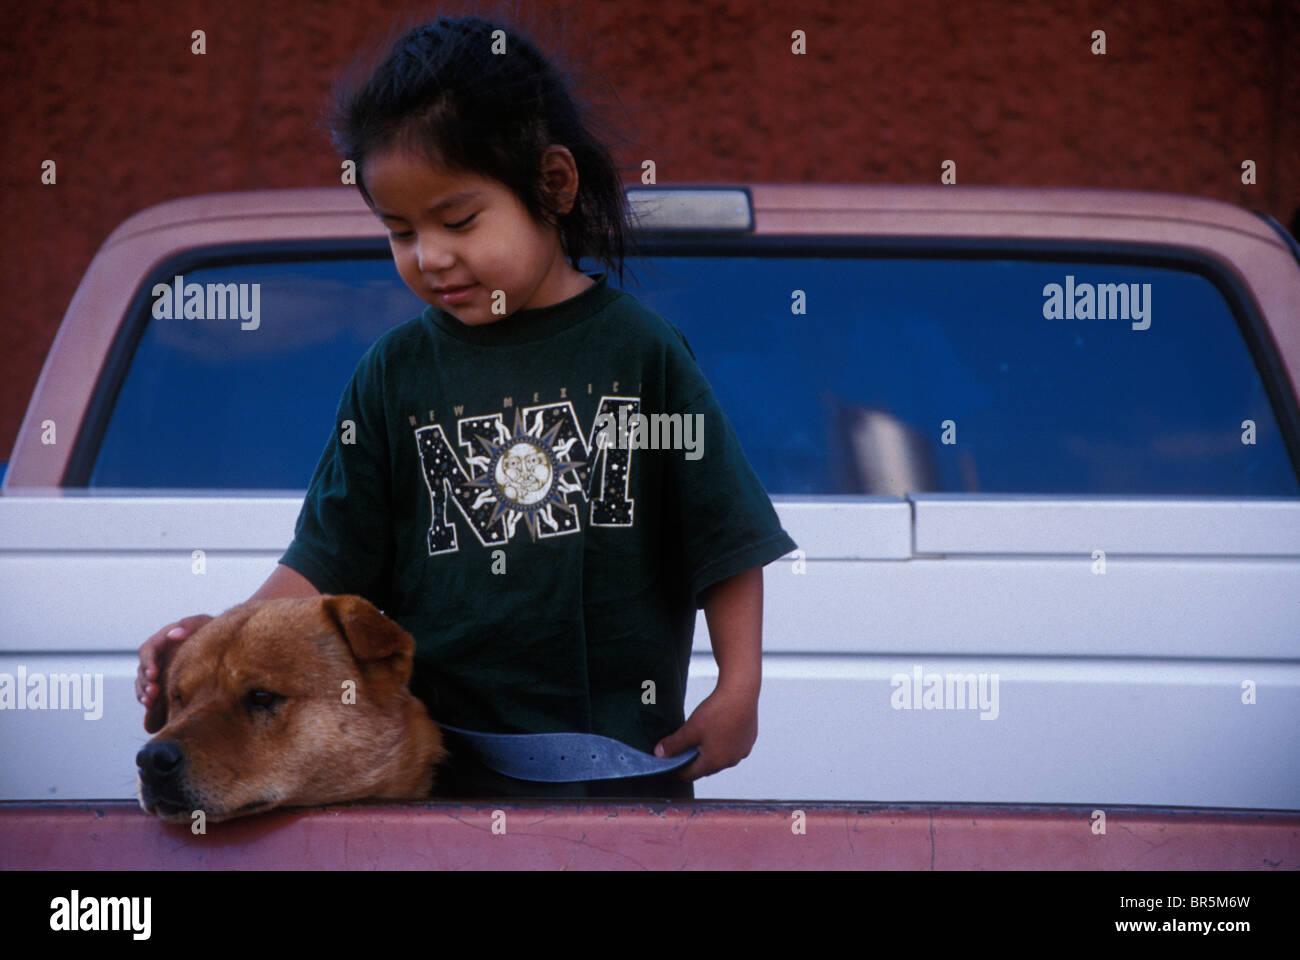 RAM veterinarians - Stock Image